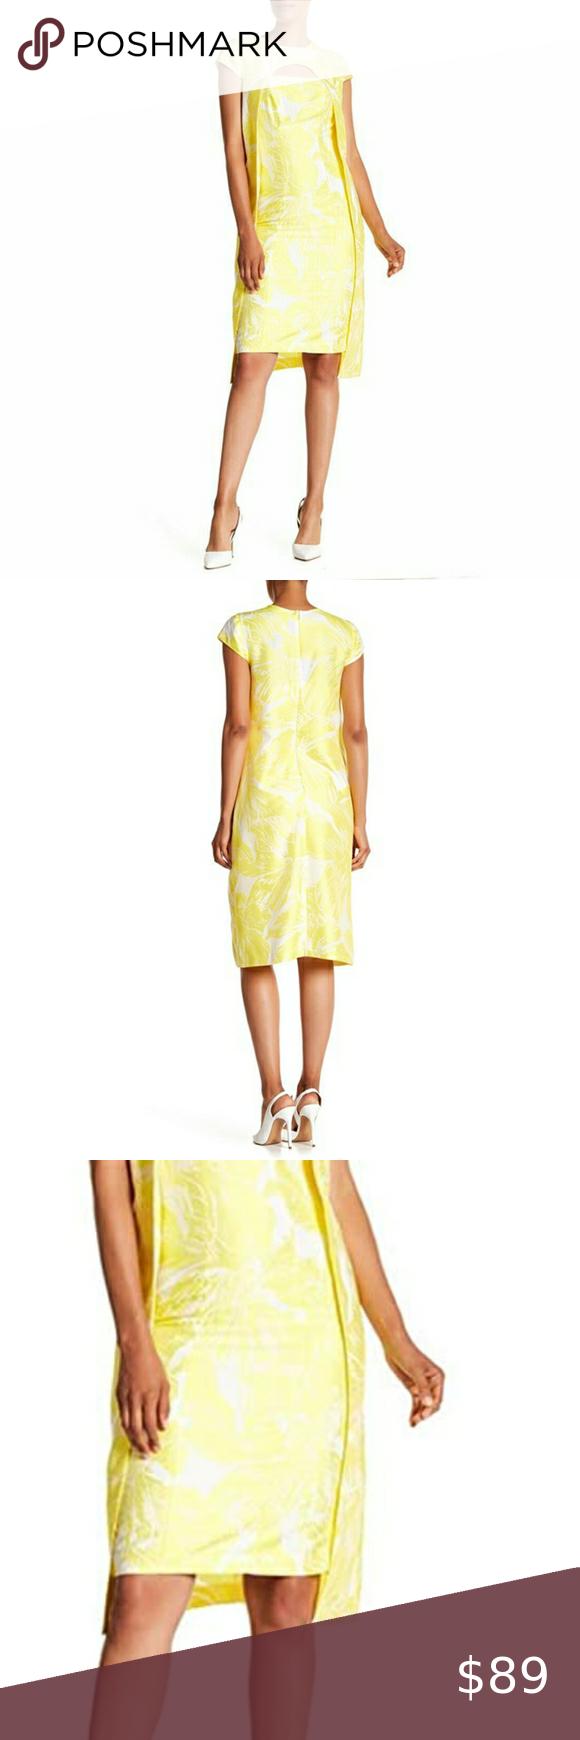 Kay Unger Sunshine Yellow Dress Dress Size Chart Women Navy Cocktail Dress Yellow Dress [ 1740 x 580 Pixel ]